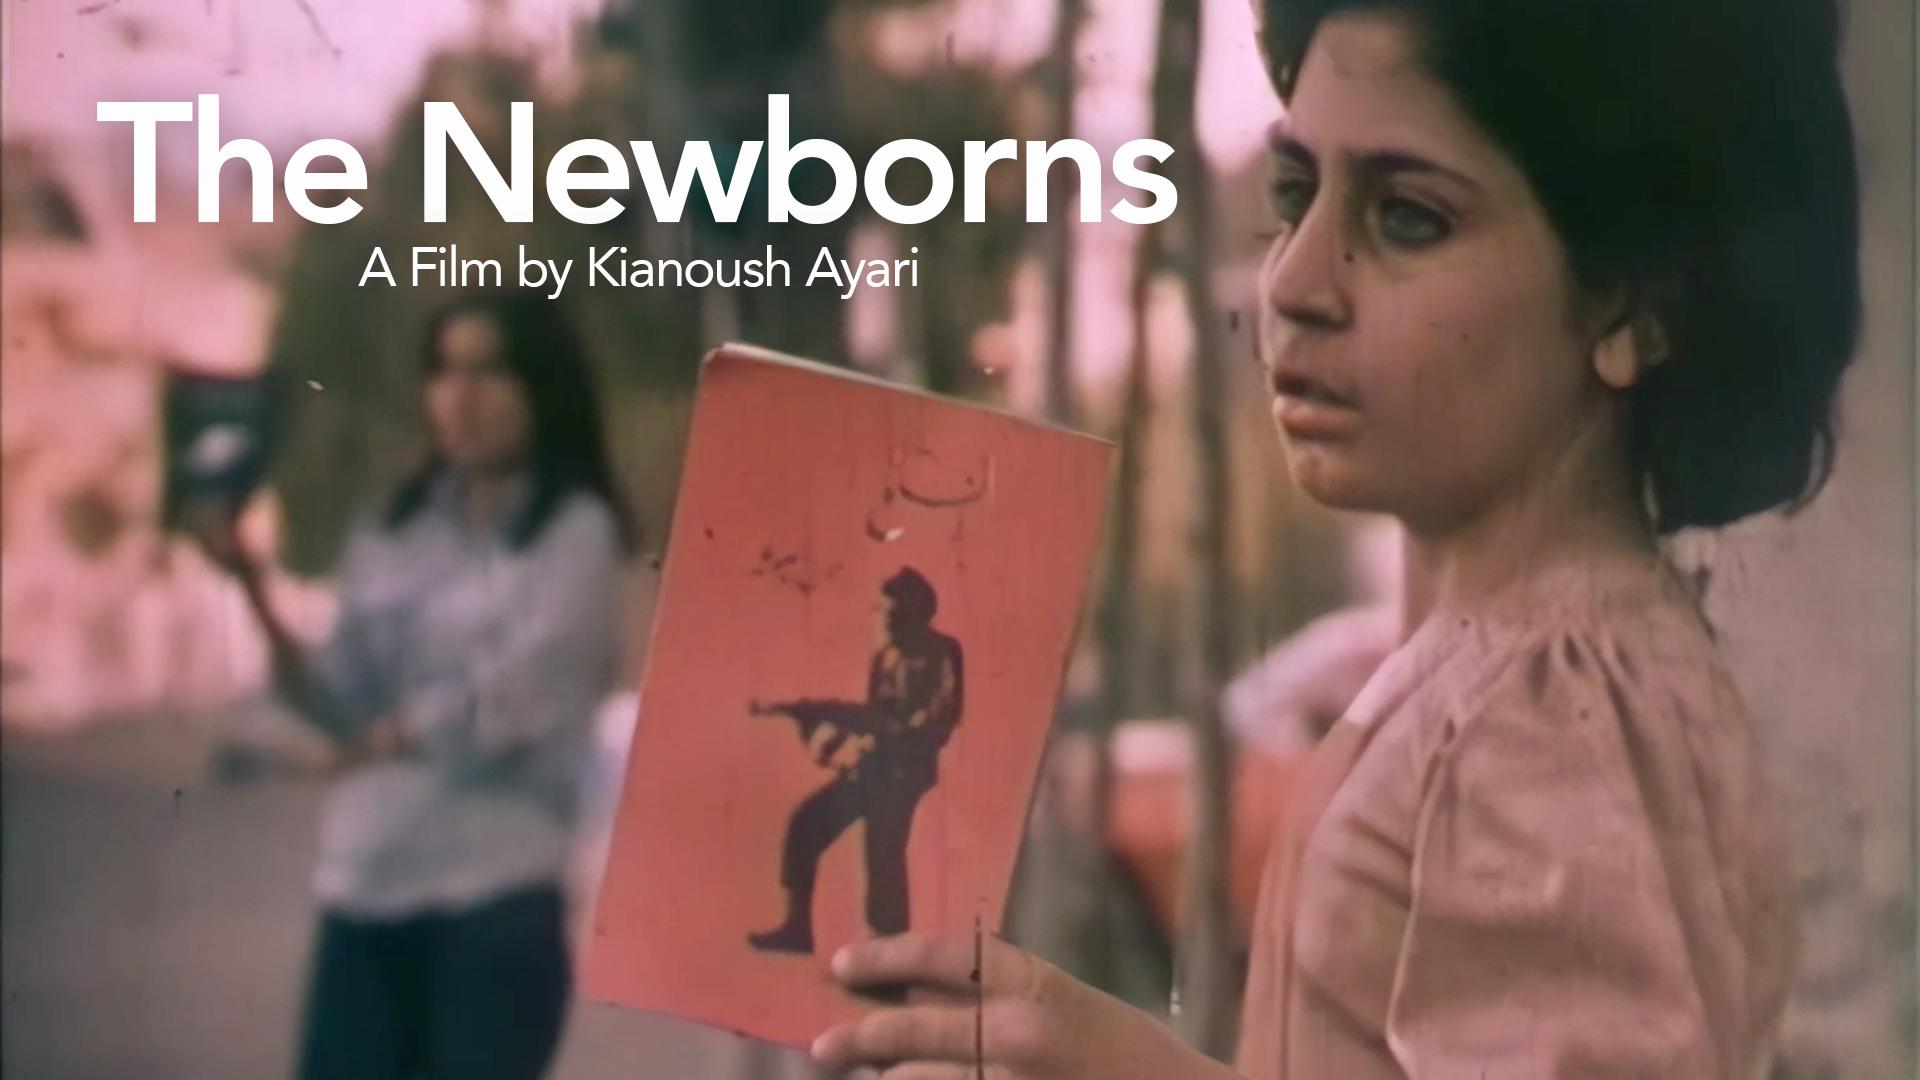 The Newborns (1979)